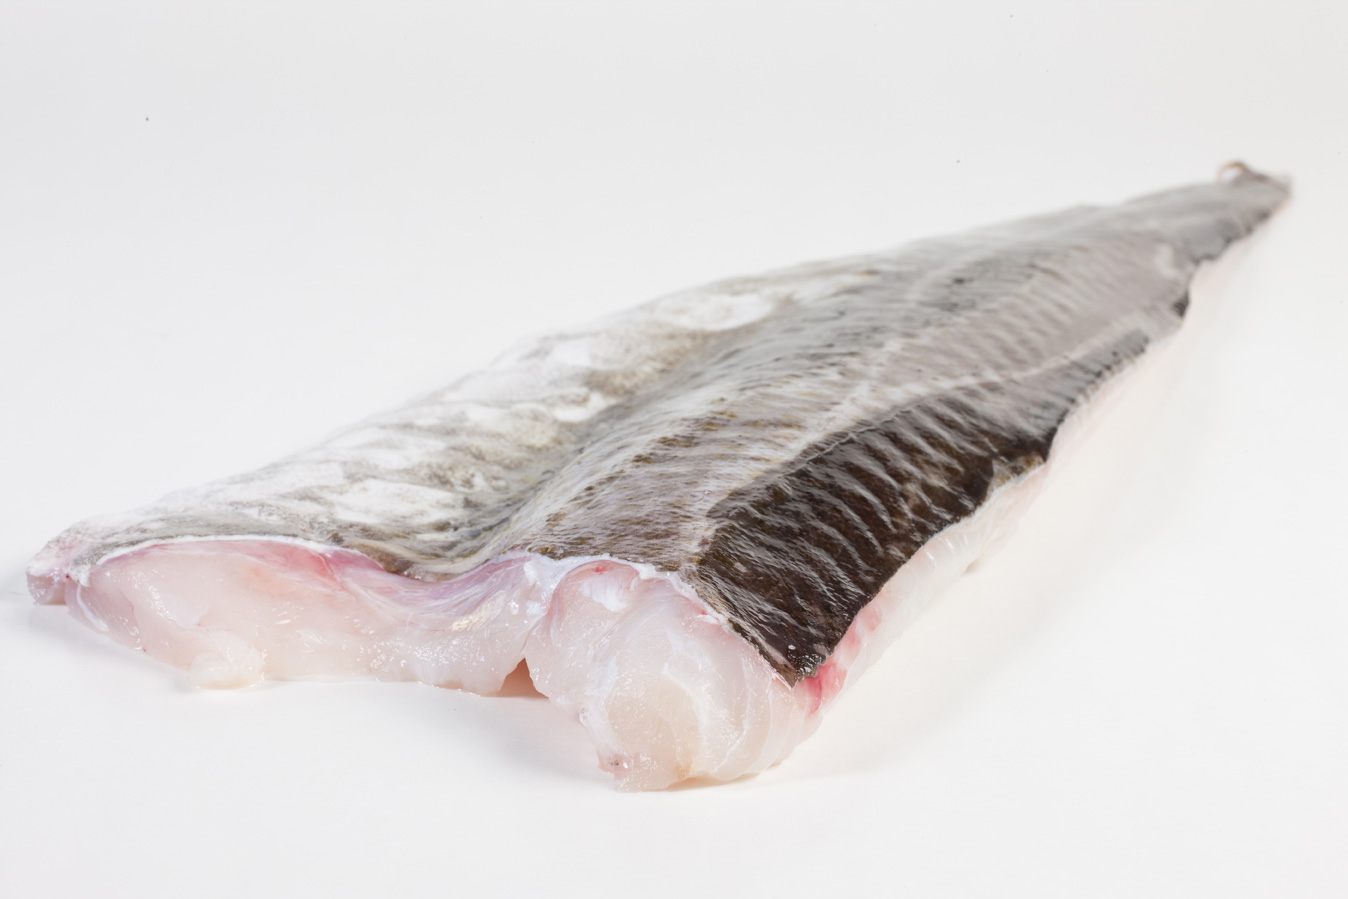 Groothandel-vis-FishXL-vis-kabeljauwfilet_WL_9190